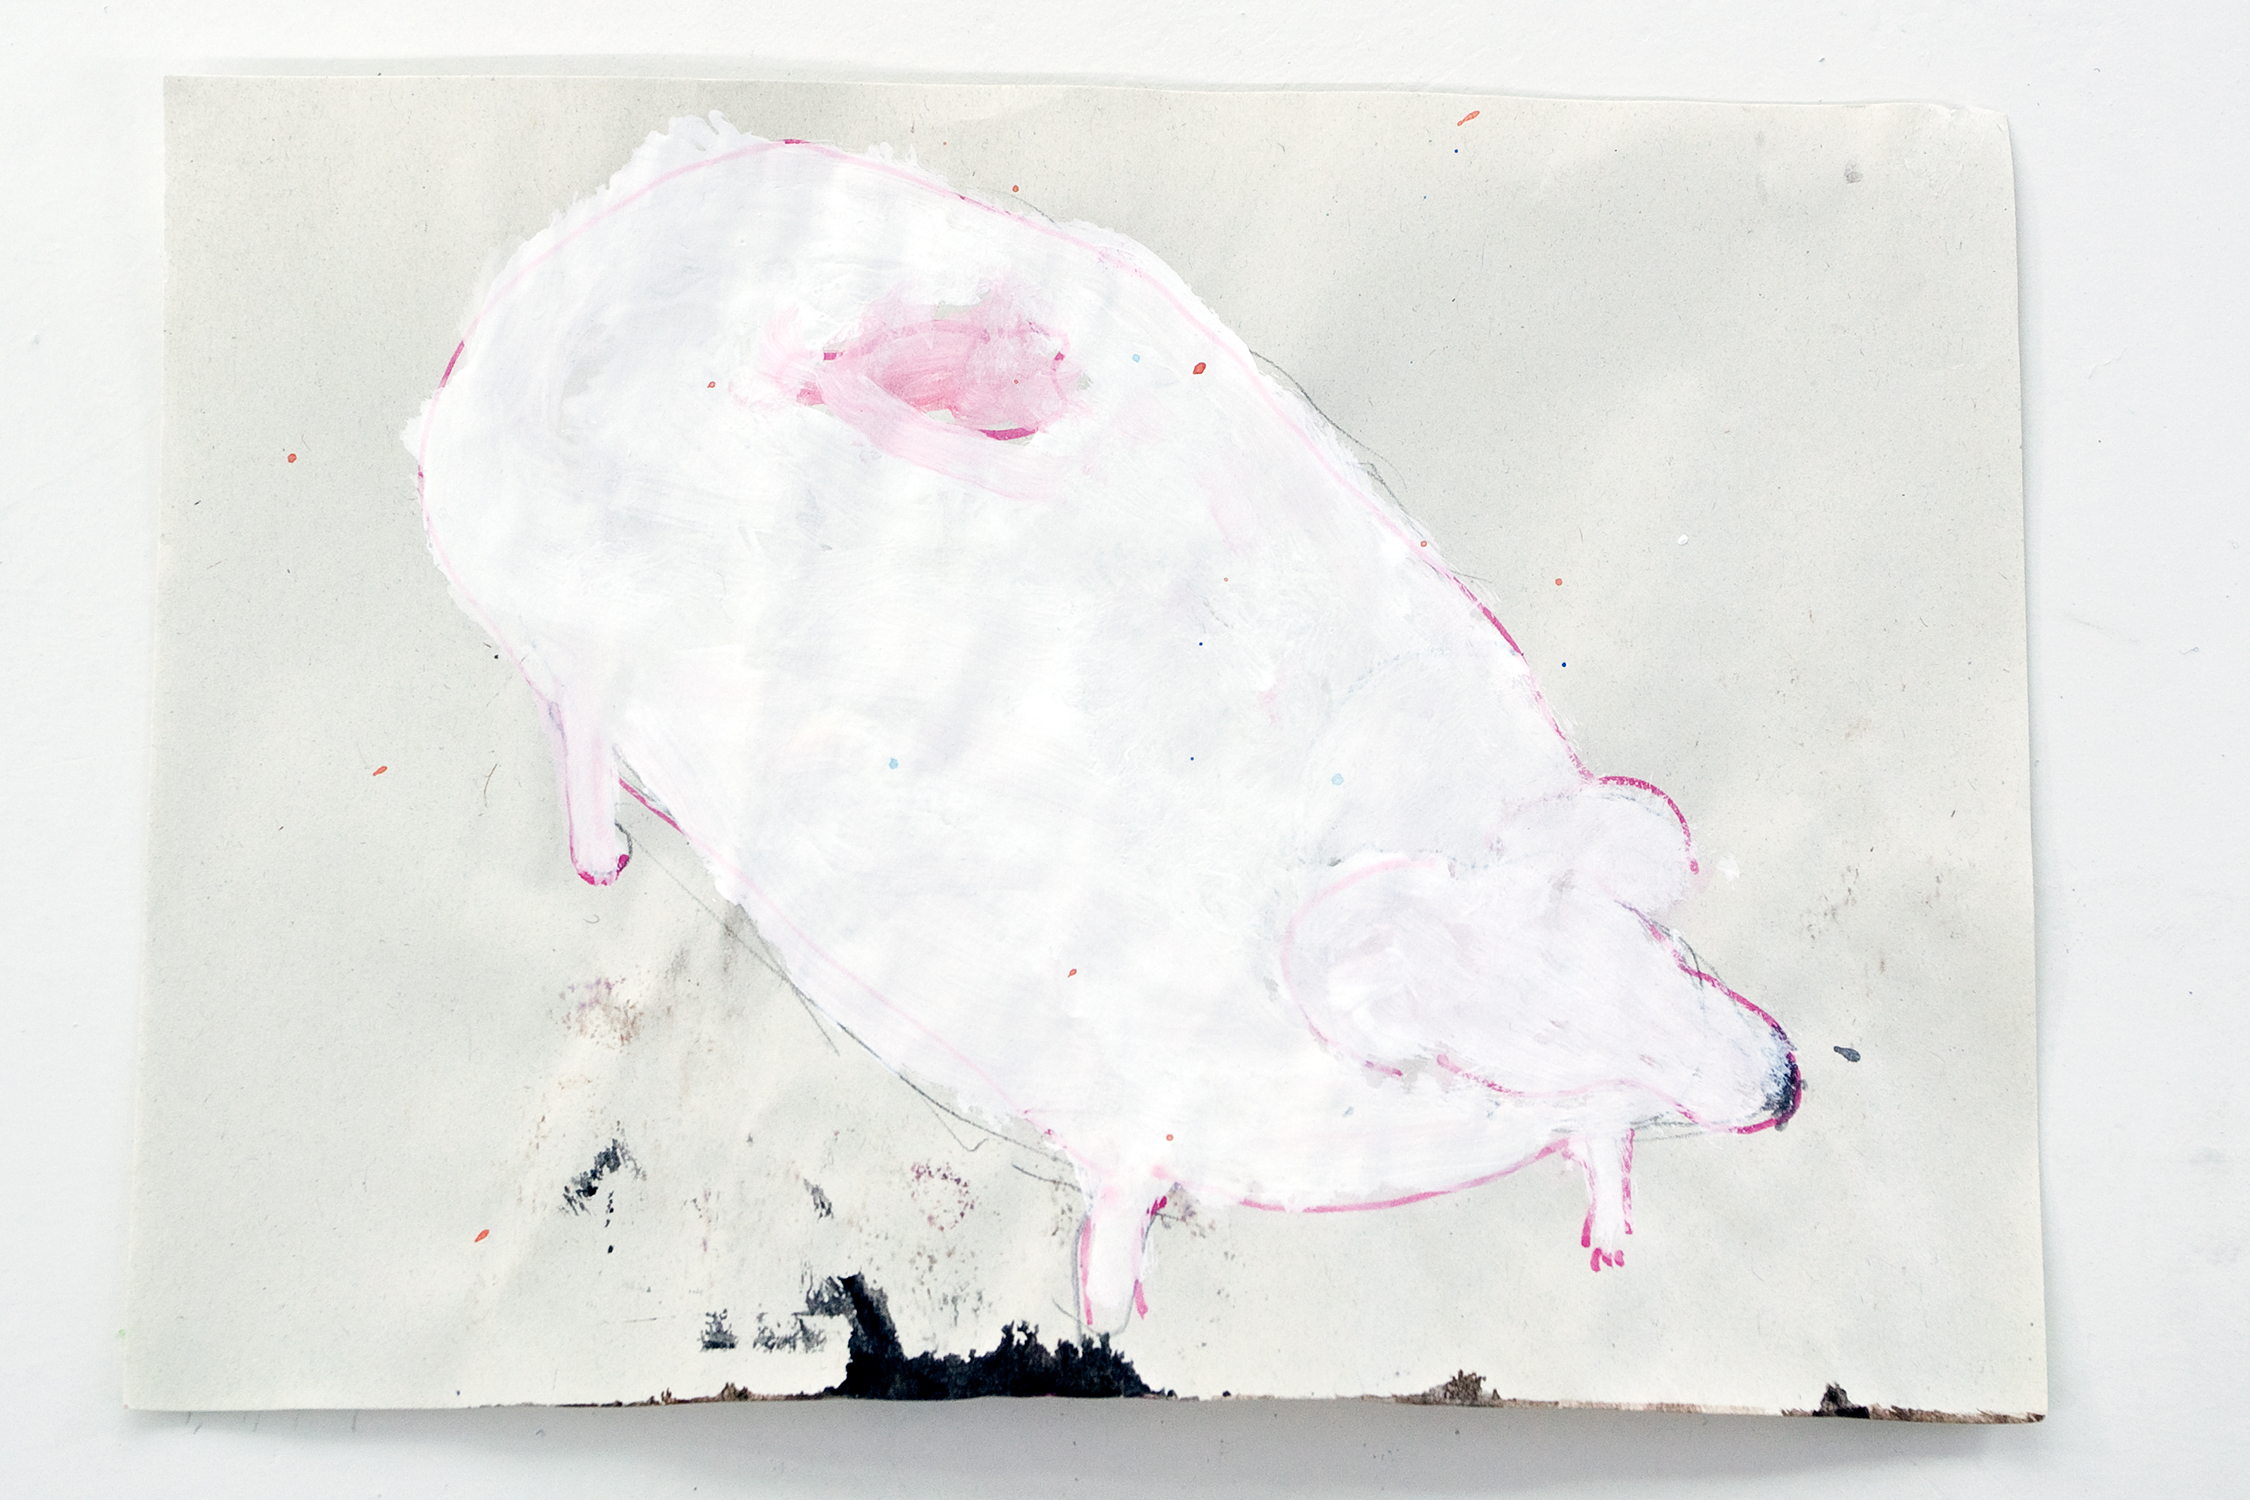 <p>Colliding Beam – Barbara Müller (detail)</p>